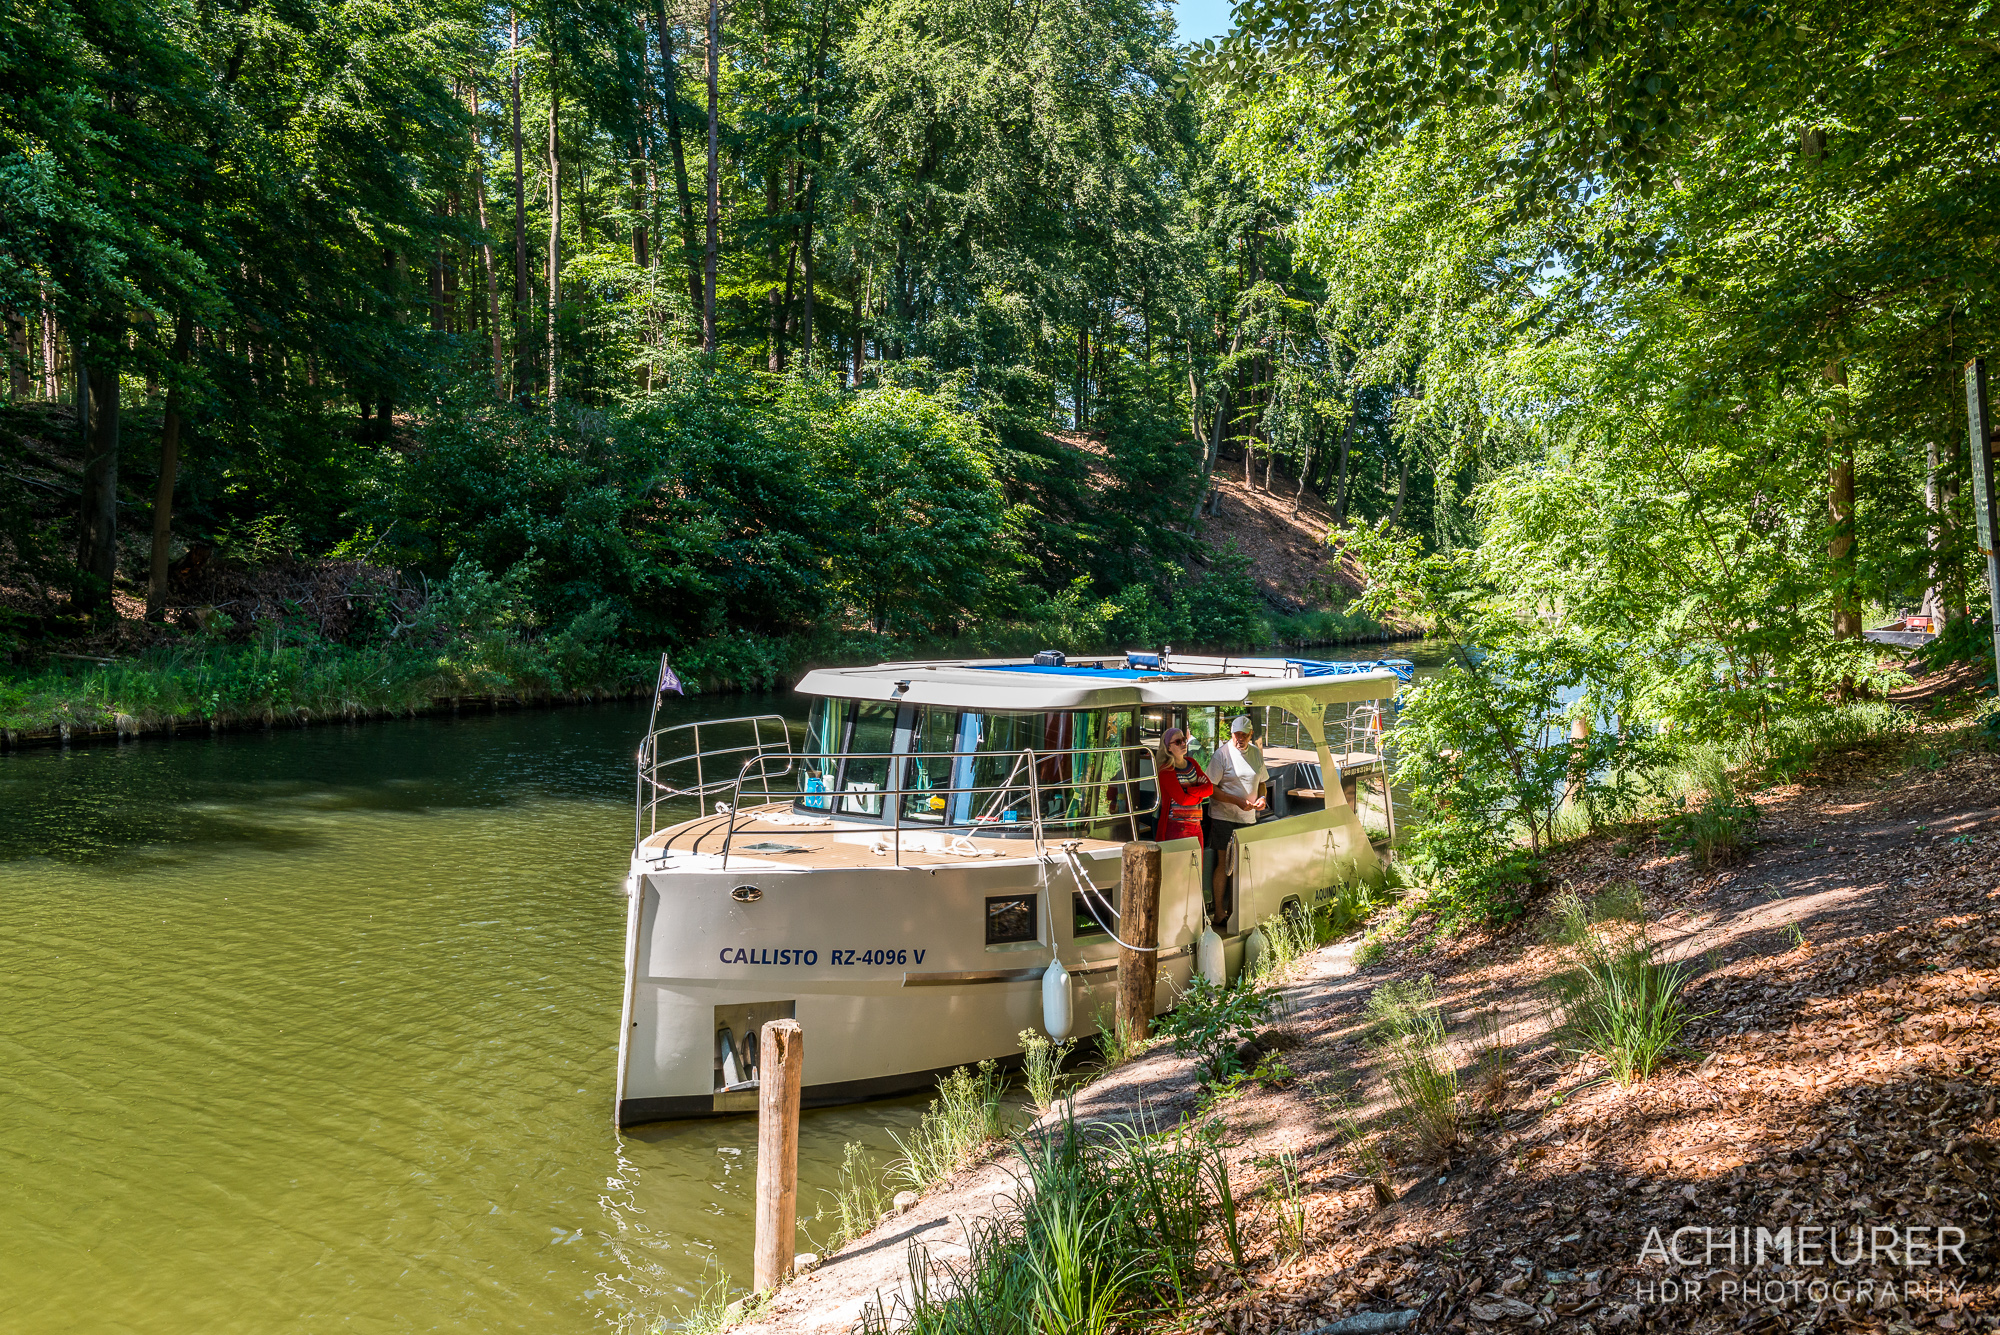 Hausboot-Kuhnle-Mueritz-Mecklenburg-Vorpommern-See_3146